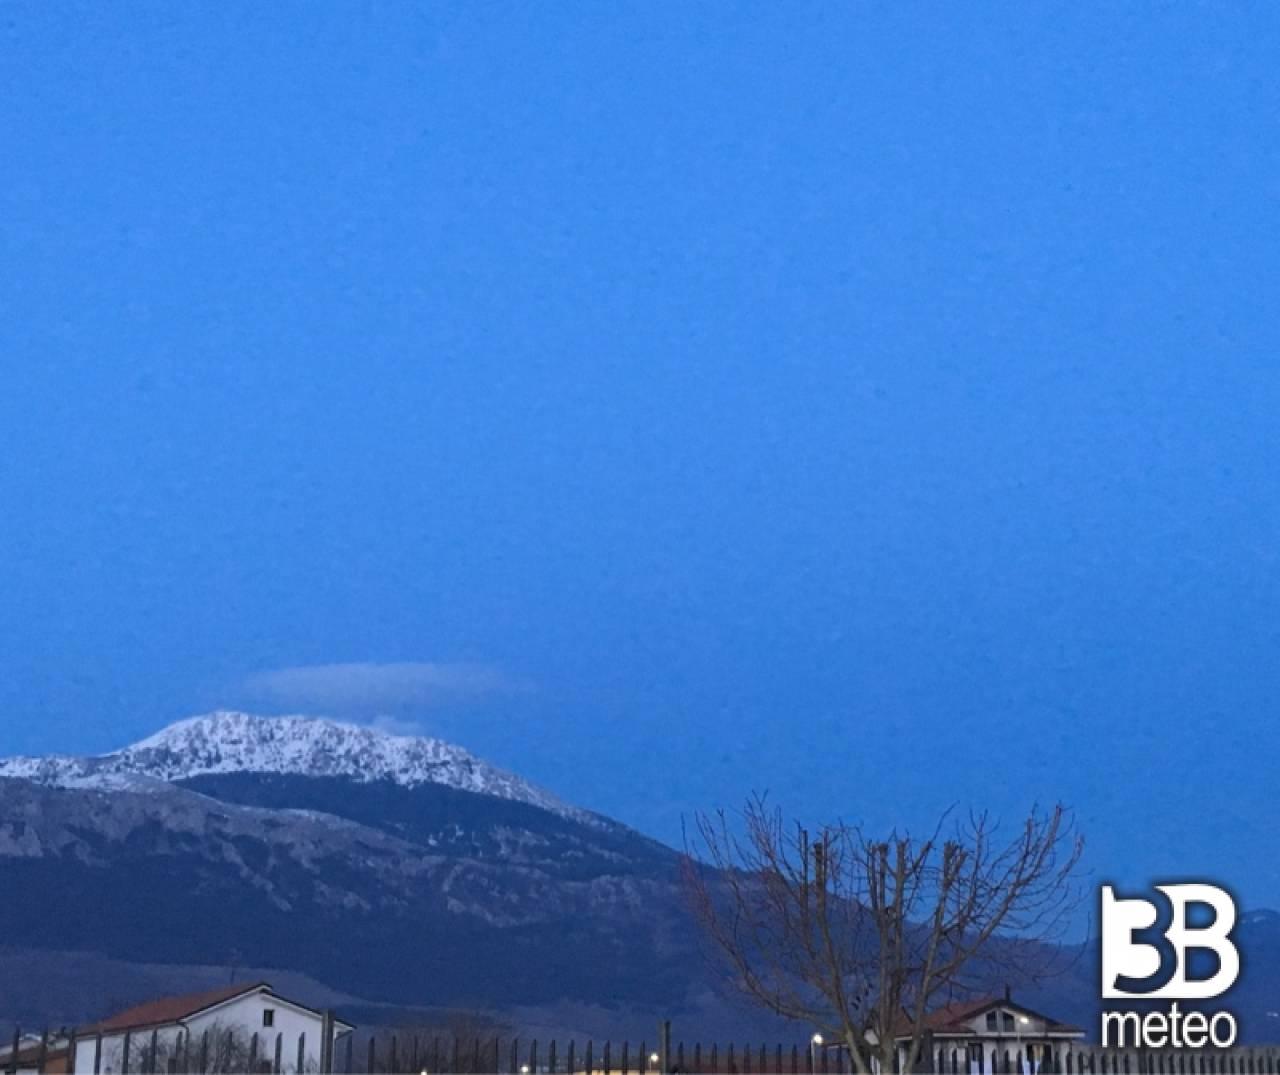 Fotosegnalazione di villa d 39 agri foto gallery 3b meteo - 3b meteo bagno di romagna ...